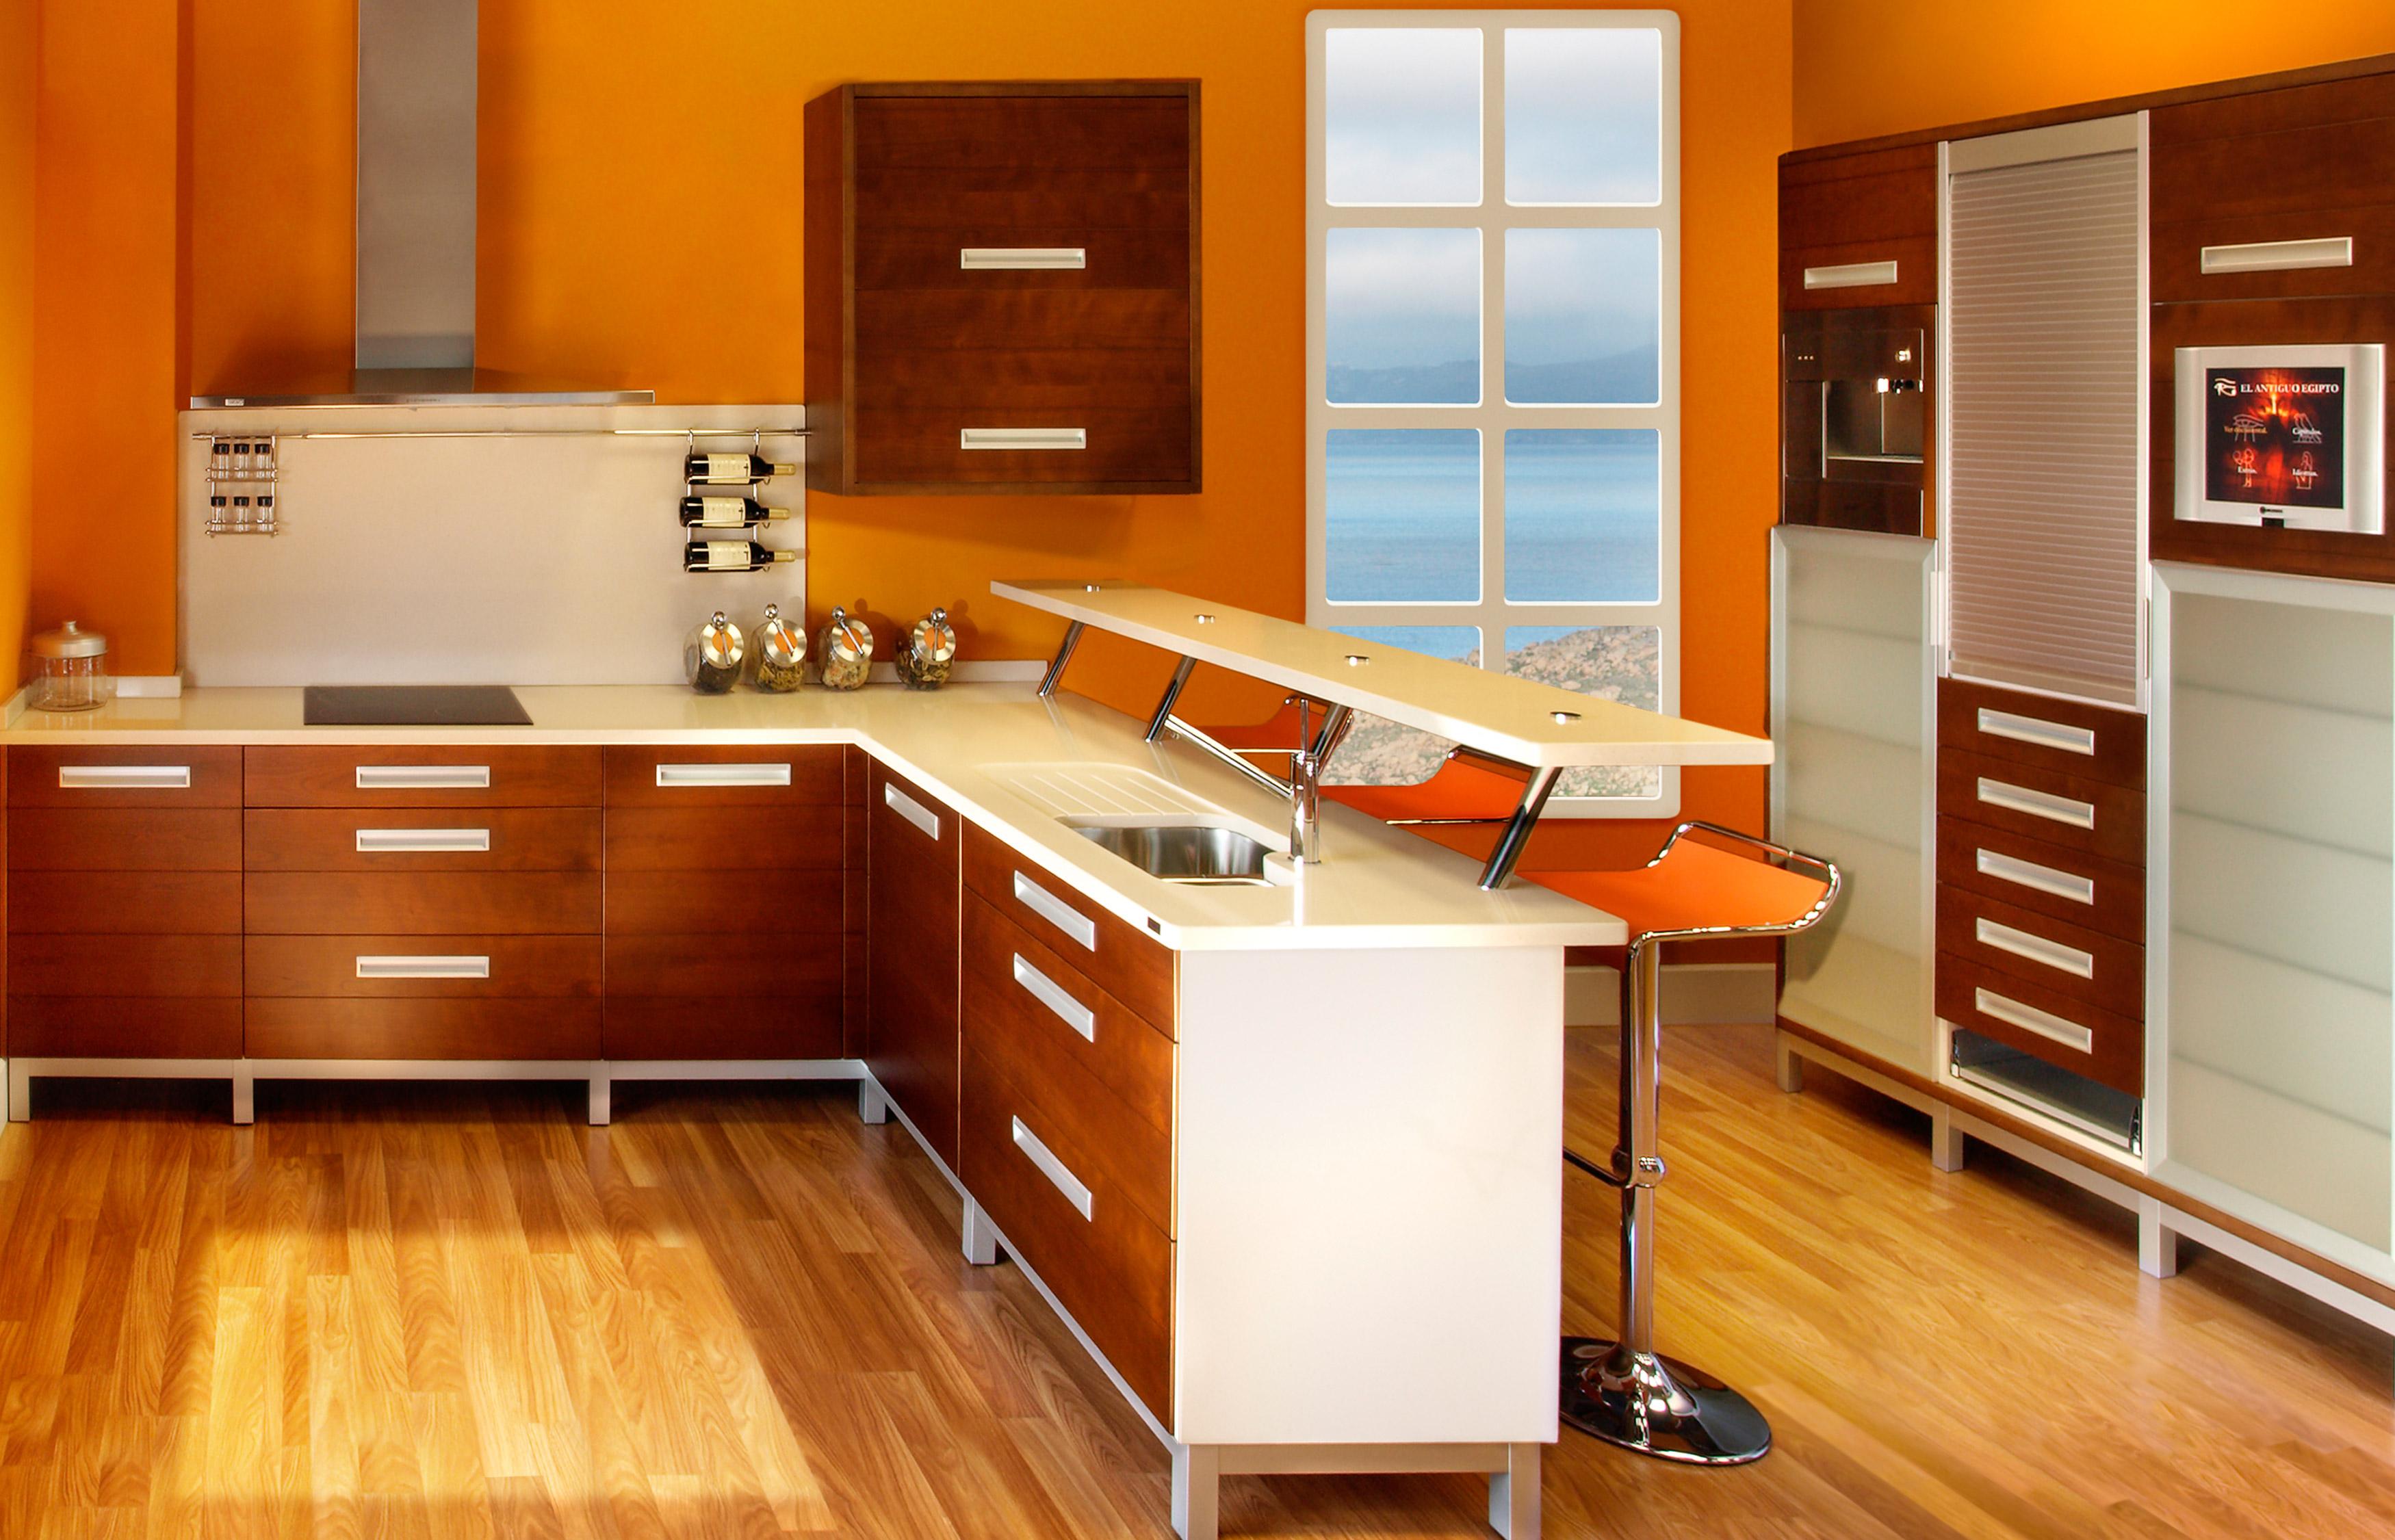 Modelo salburgo muebles de cocina online for Modelos muebles cocina